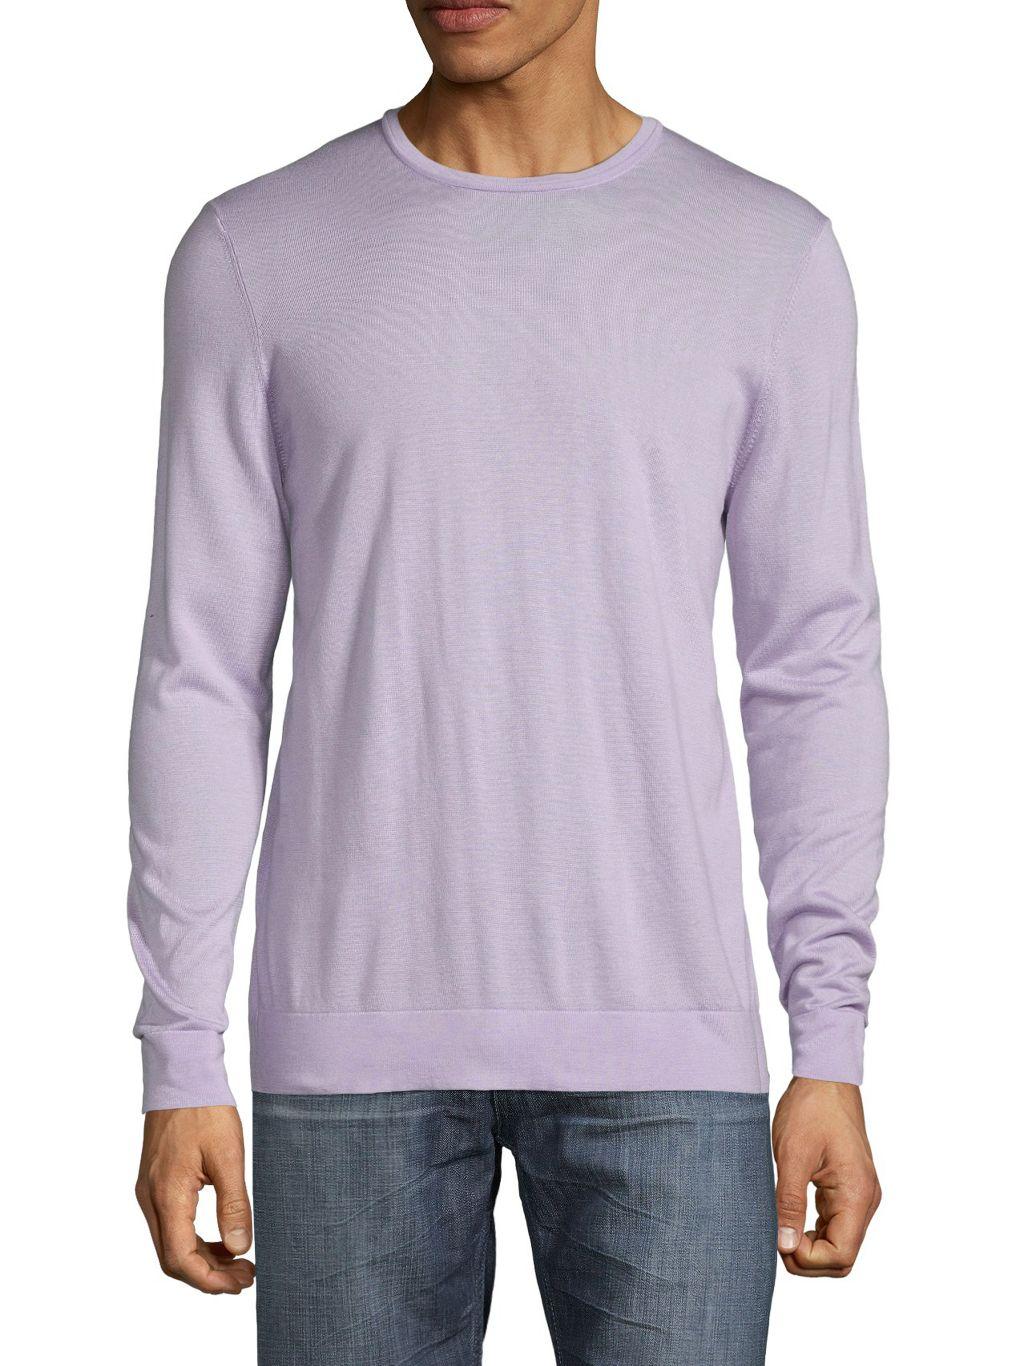 Saks Fifth Avenue Double-Neck Long-Sleeve T-Shirt